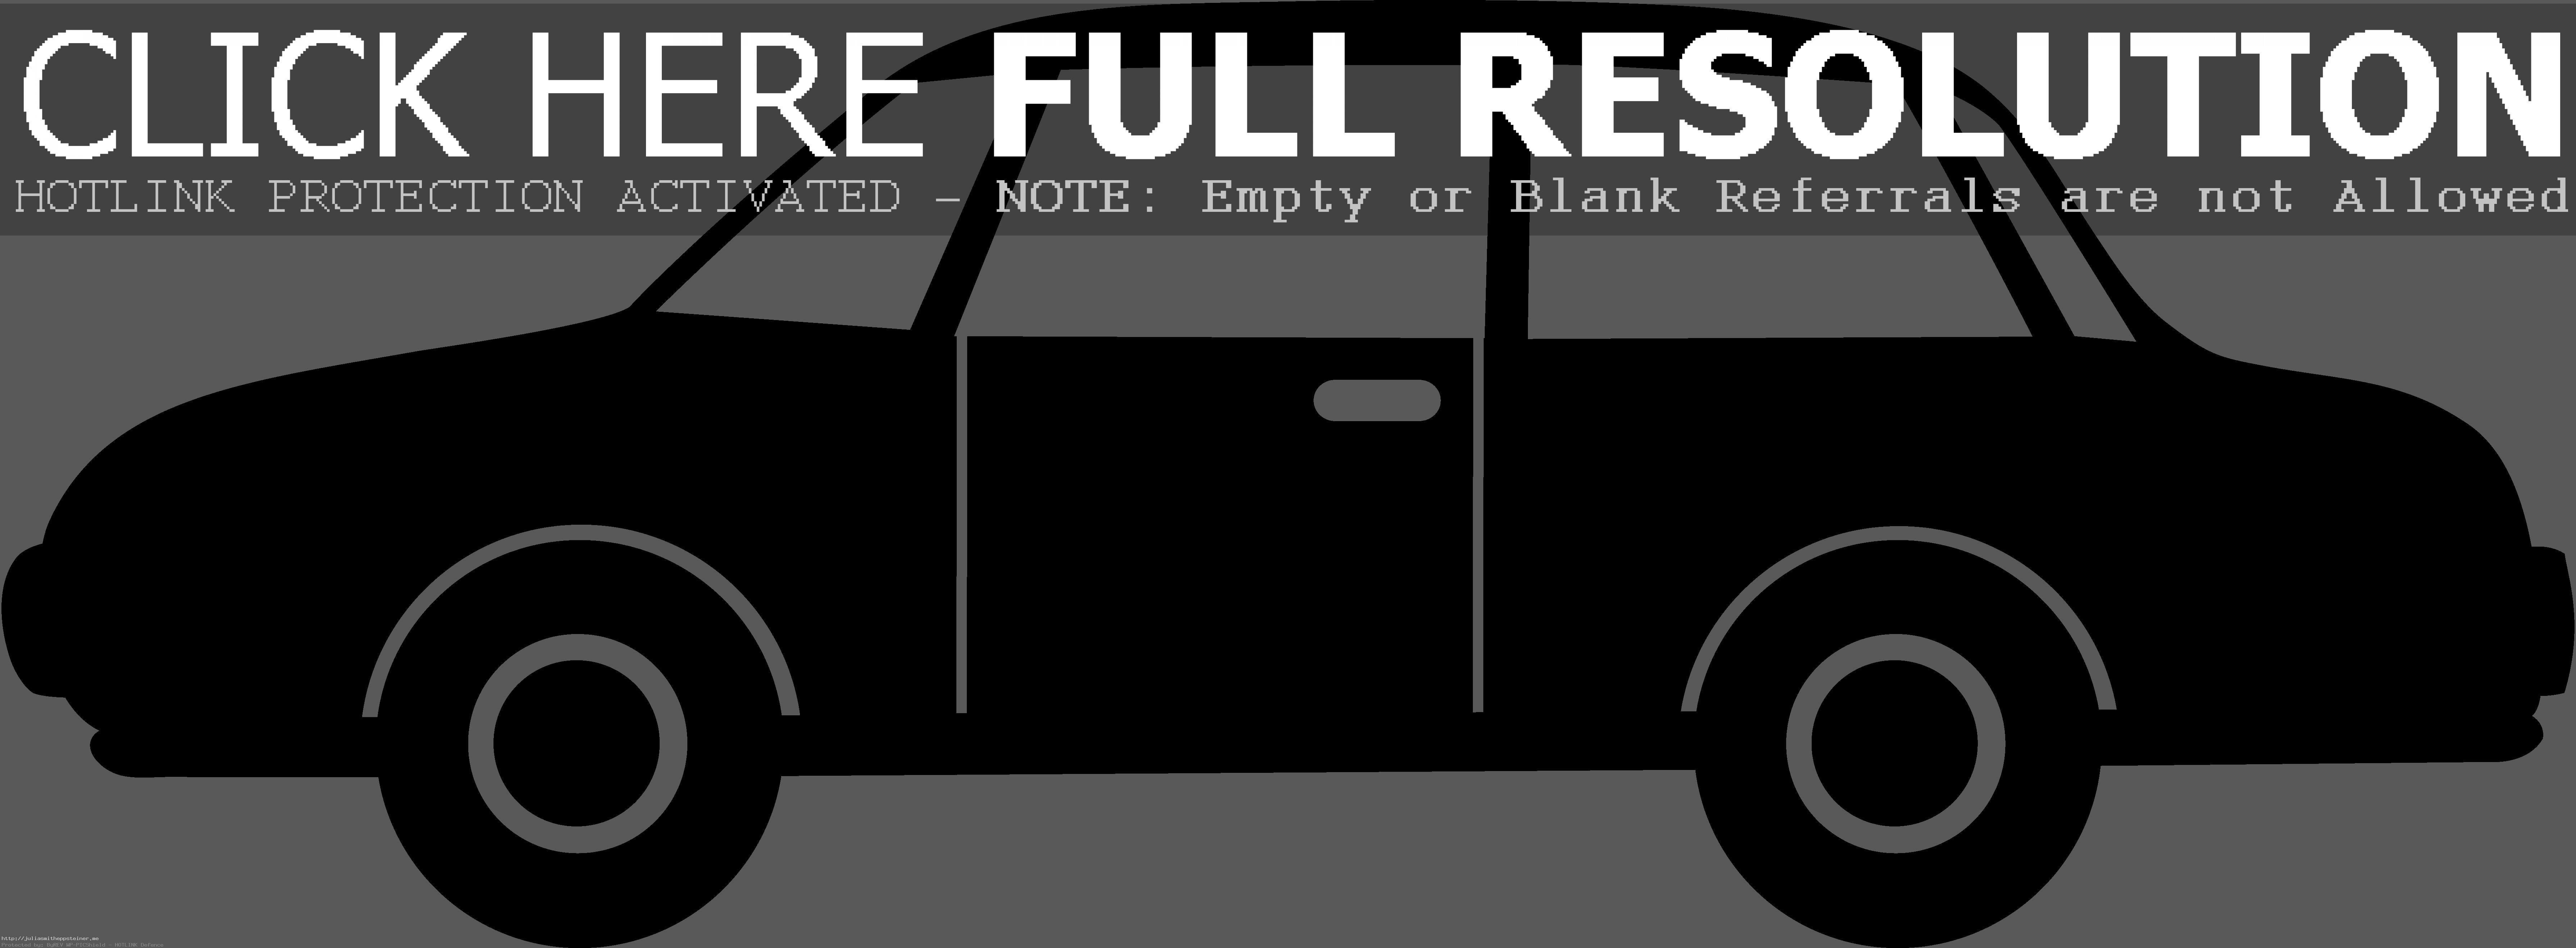 Black Car Clipart Design Droide · Car Images Clip Art Clipart Panda Free  Throughout ClipartLook.com